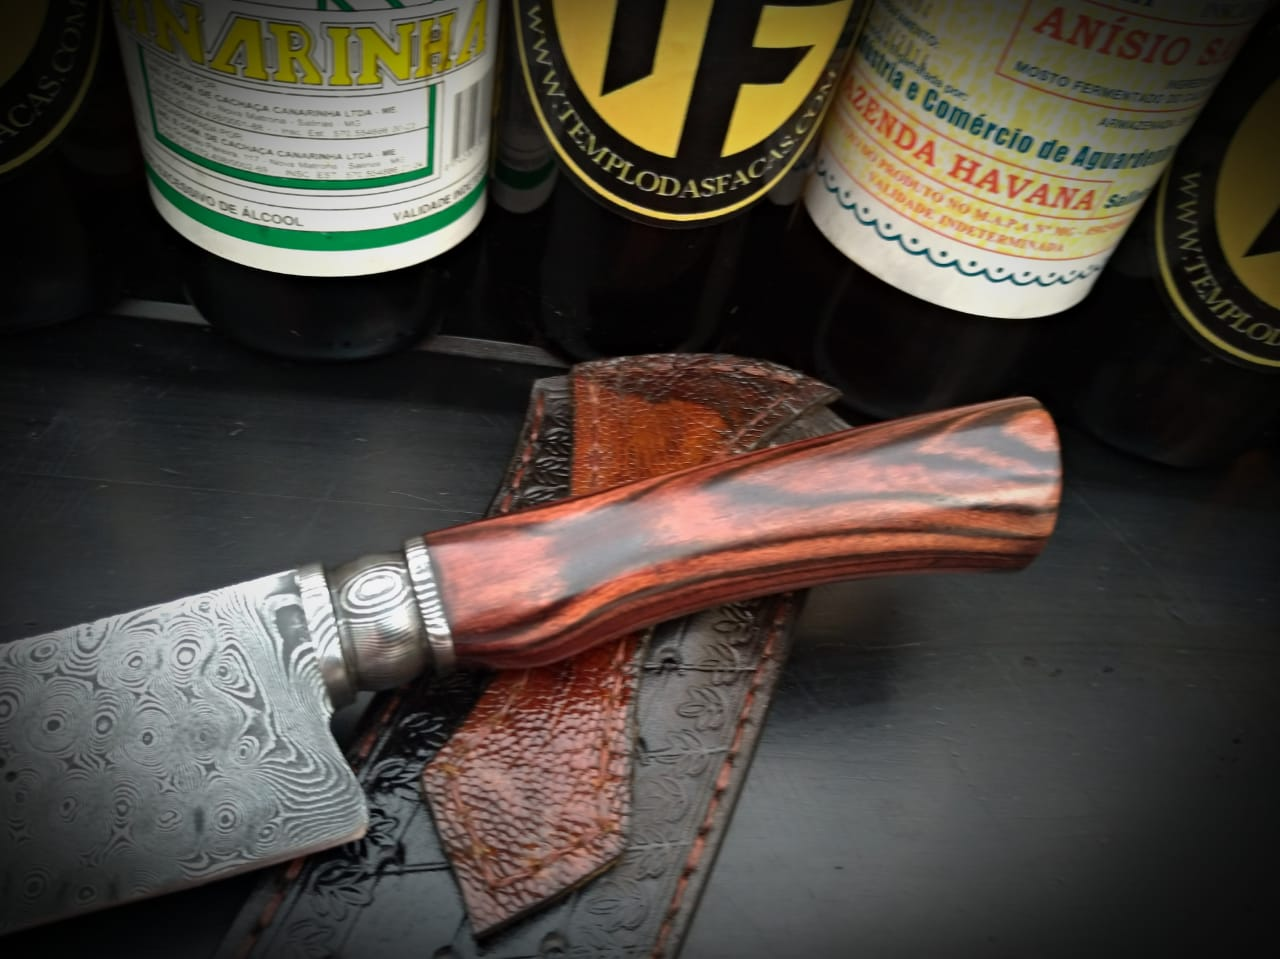 Faca artesanal forjada raindrop violet aço de damasco 8 polegadas